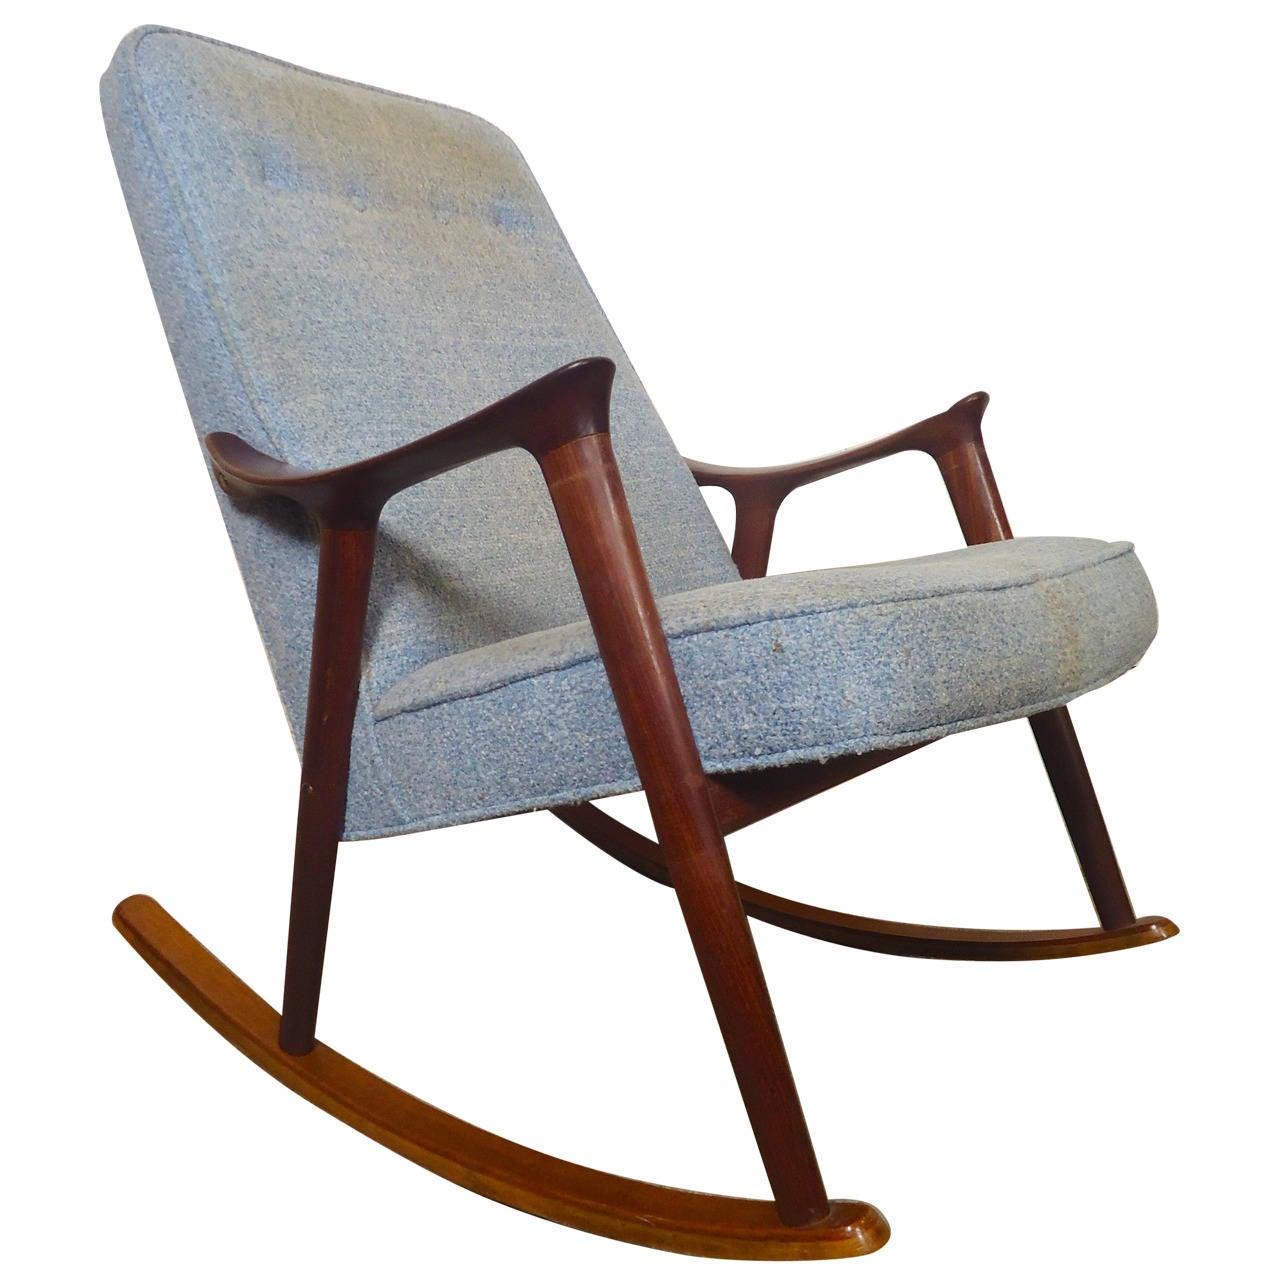 mid century modern sculpted rocker by ingmar relling at 1stdibs. Black Bedroom Furniture Sets. Home Design Ideas